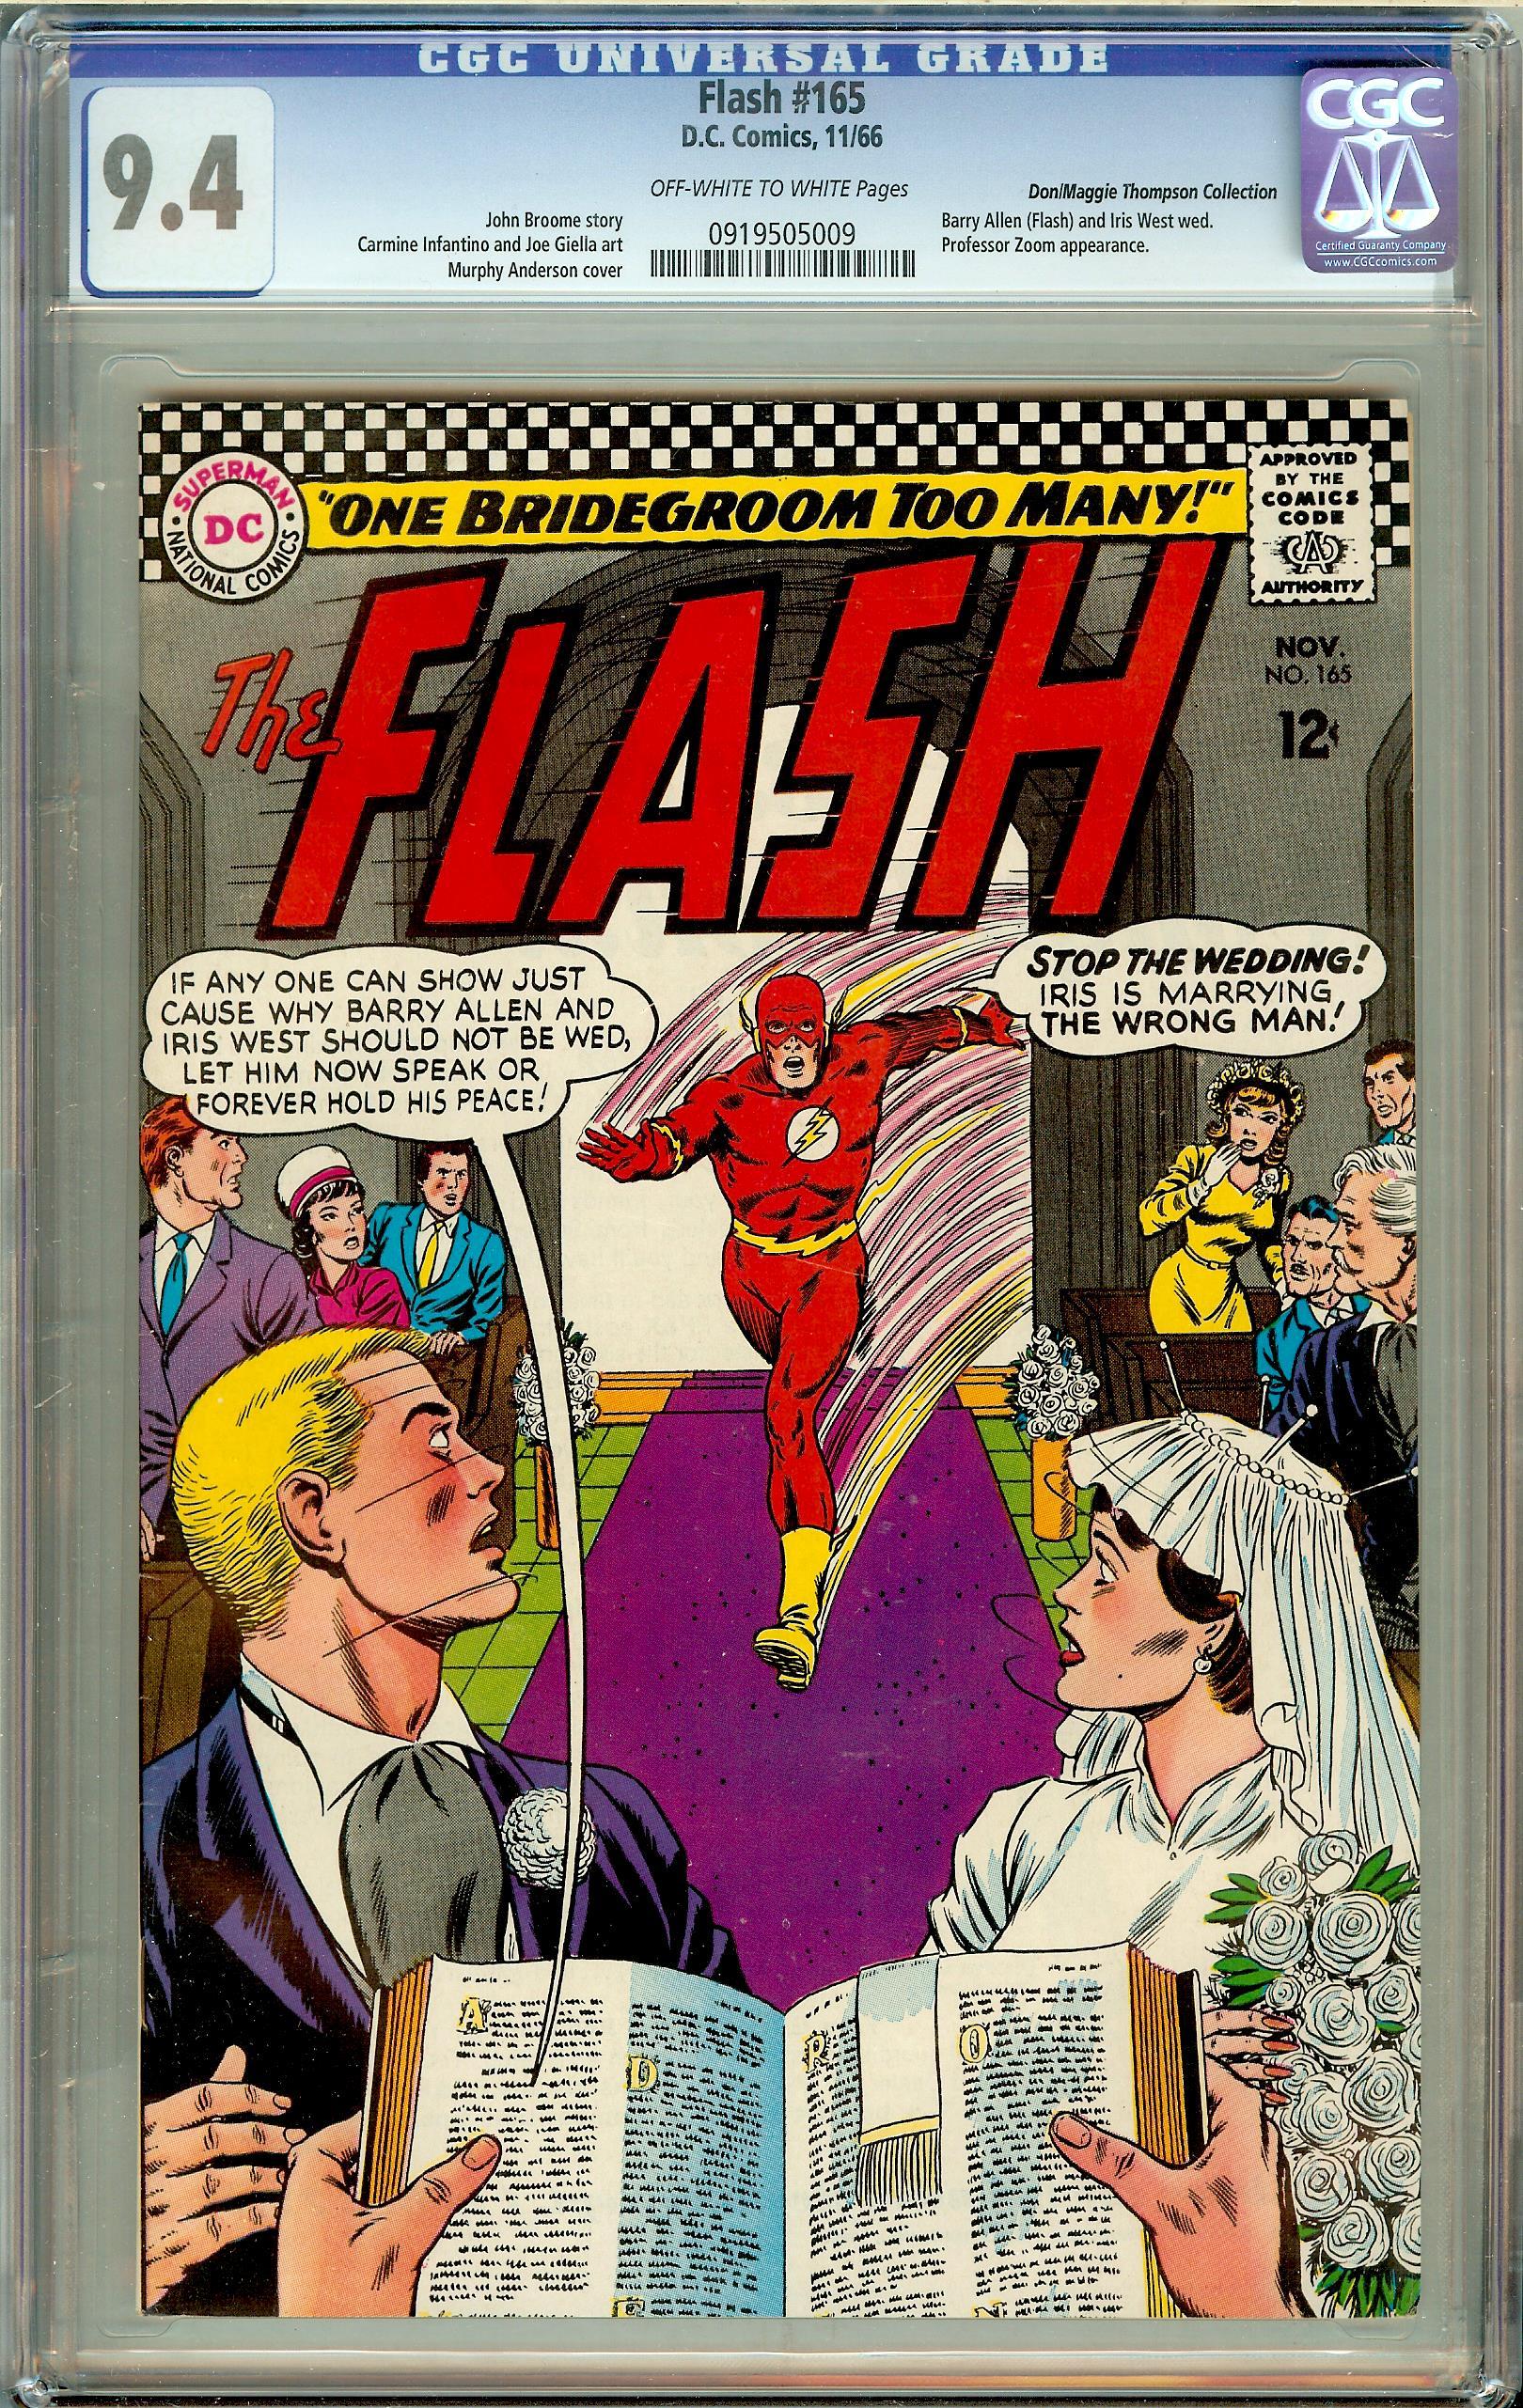 Flash #165